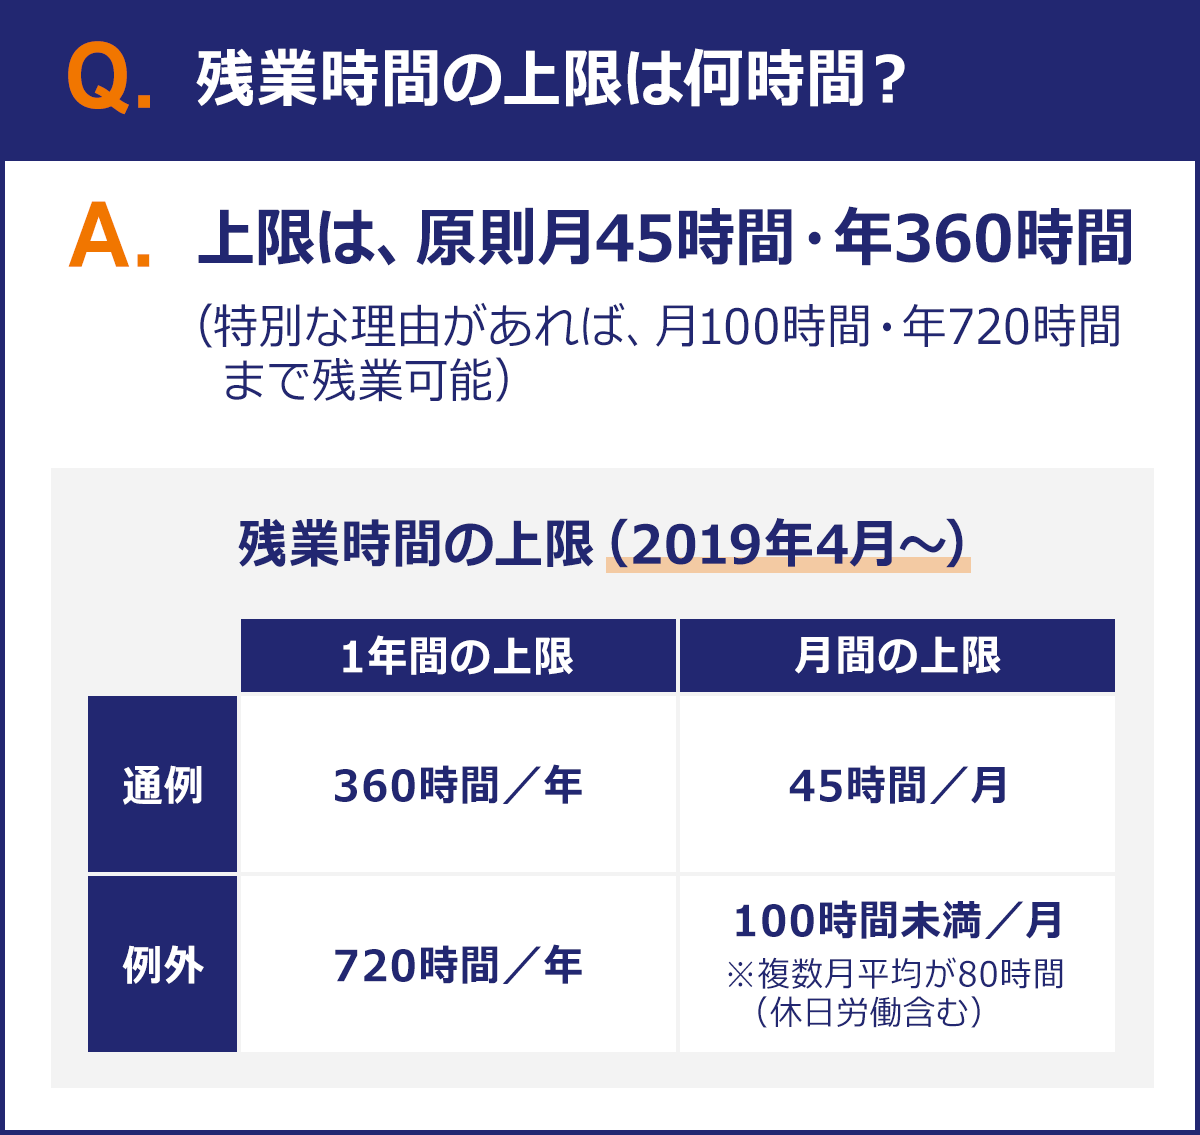 【Q:残業時間の上限は何時間?】 A:上限は原則月45時間・年360時間(特別な理由があれば、月100時間・年720時間まで残業可能※複数月平均が80時間(休日労働含む))